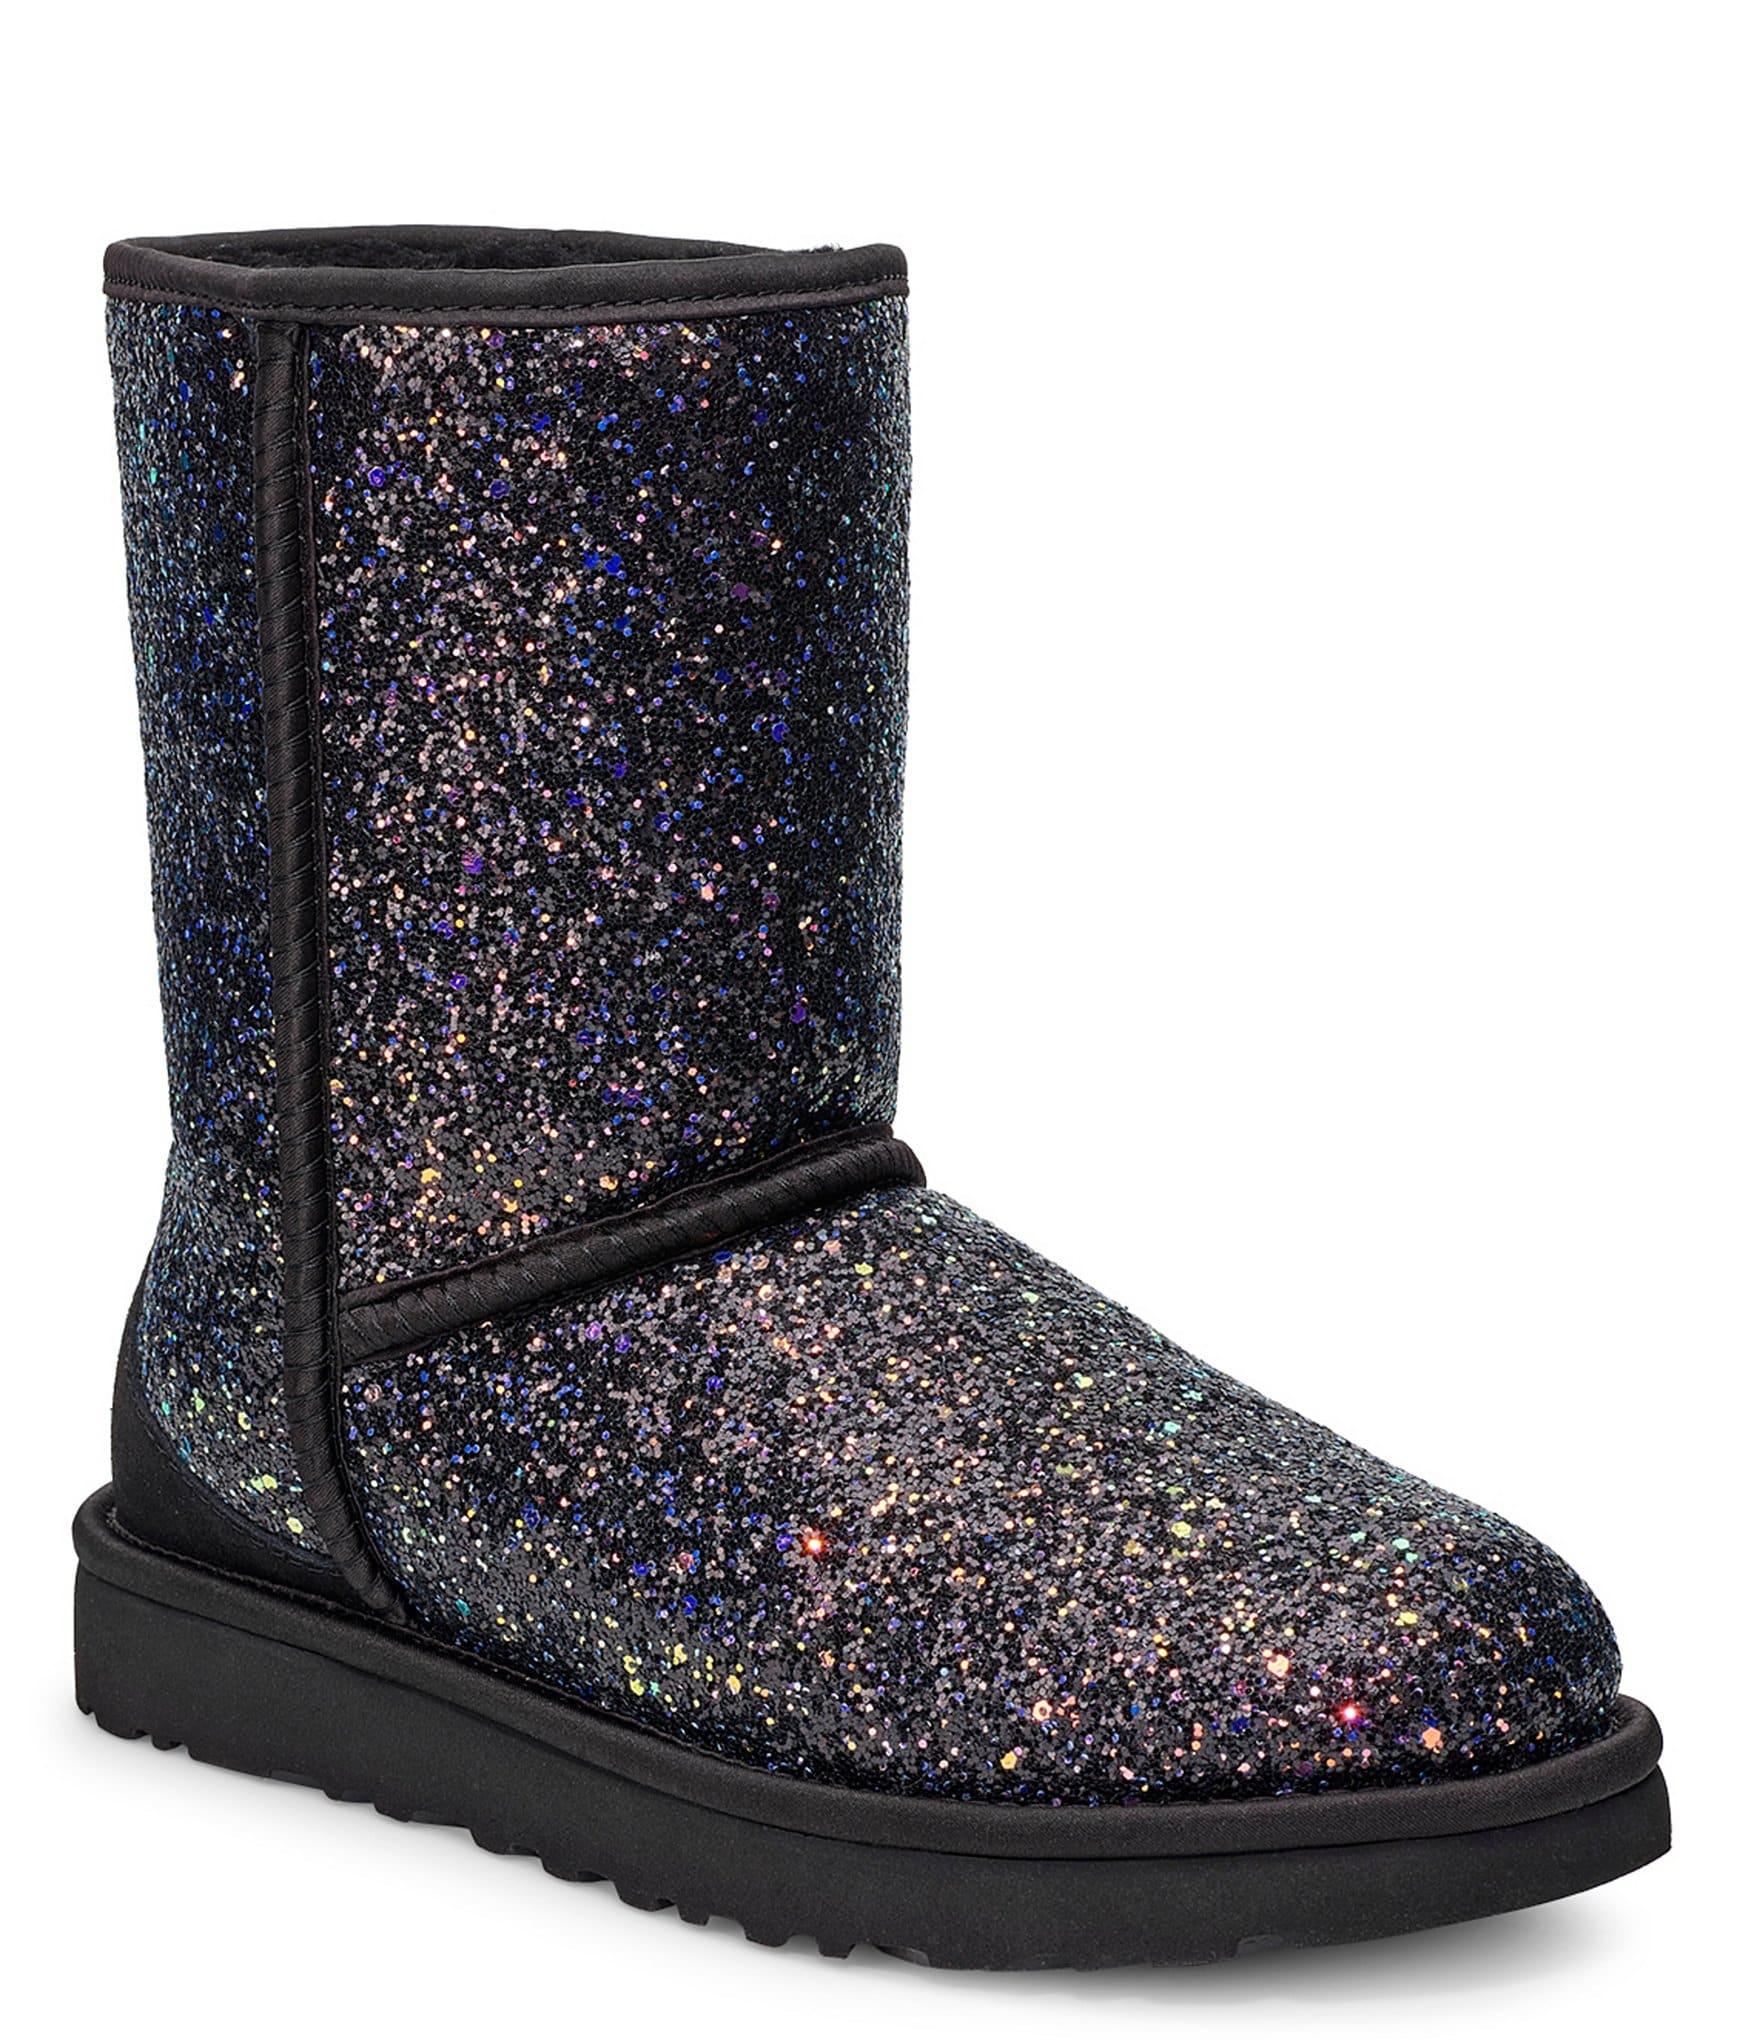 Ugg Classic Short Cosmos Glitter Boots Dillard S